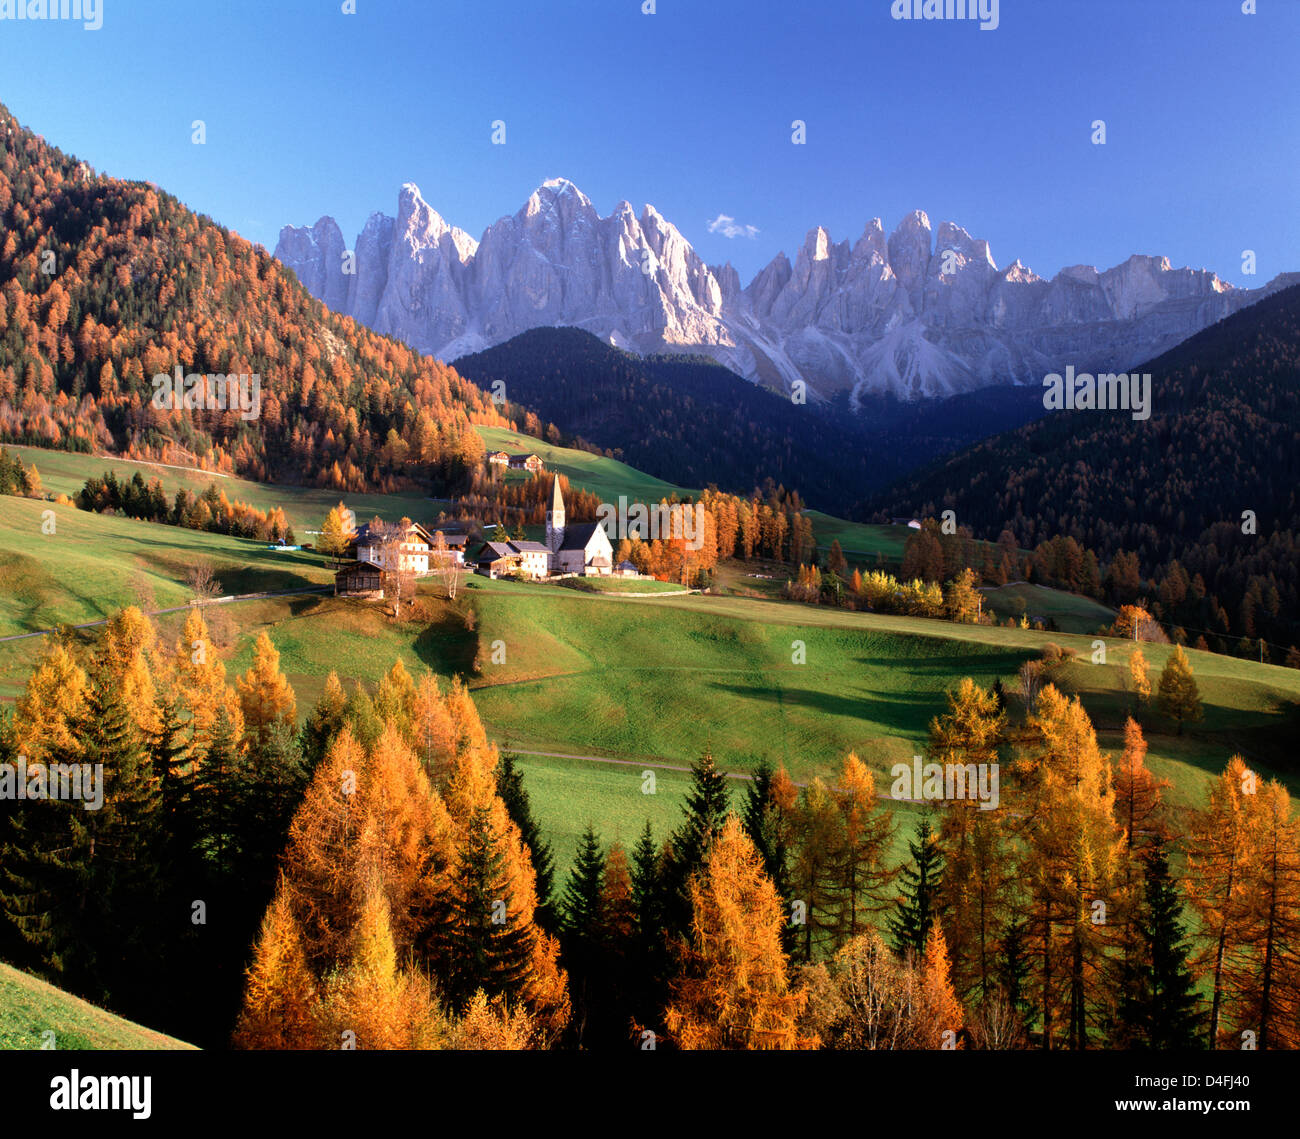 Free Fall Hp Widescreen Wallpapers St Magdalena Val Di Funes Alto Adige Trentino Italy